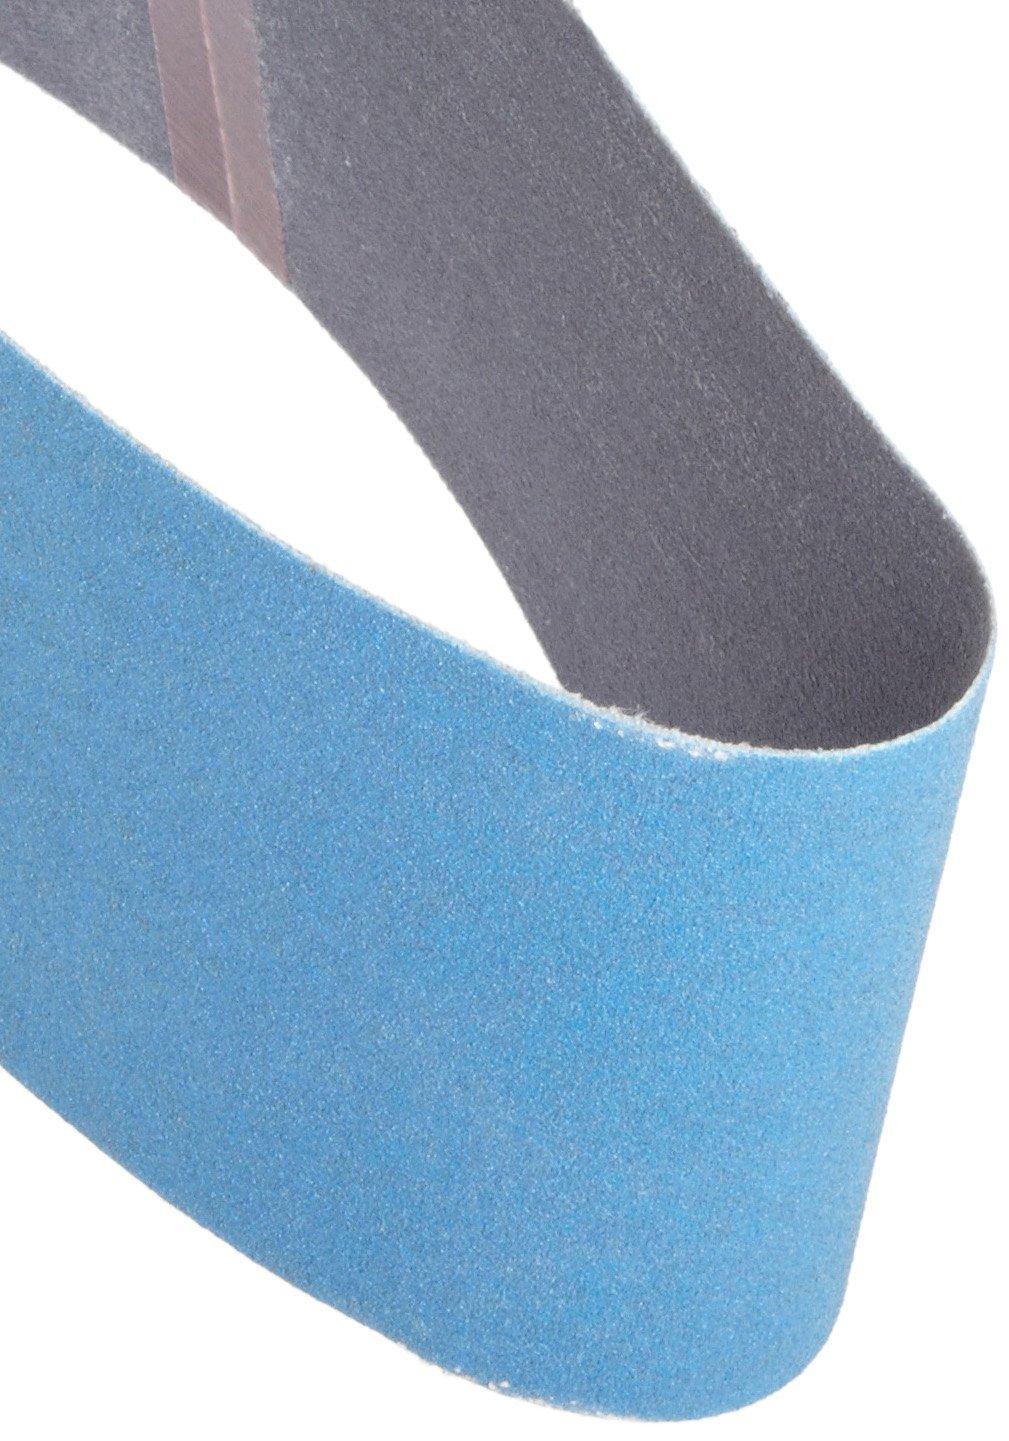 Norton 49256 3X  3 x 18 120 Grit Sanding Belt Pack of 5